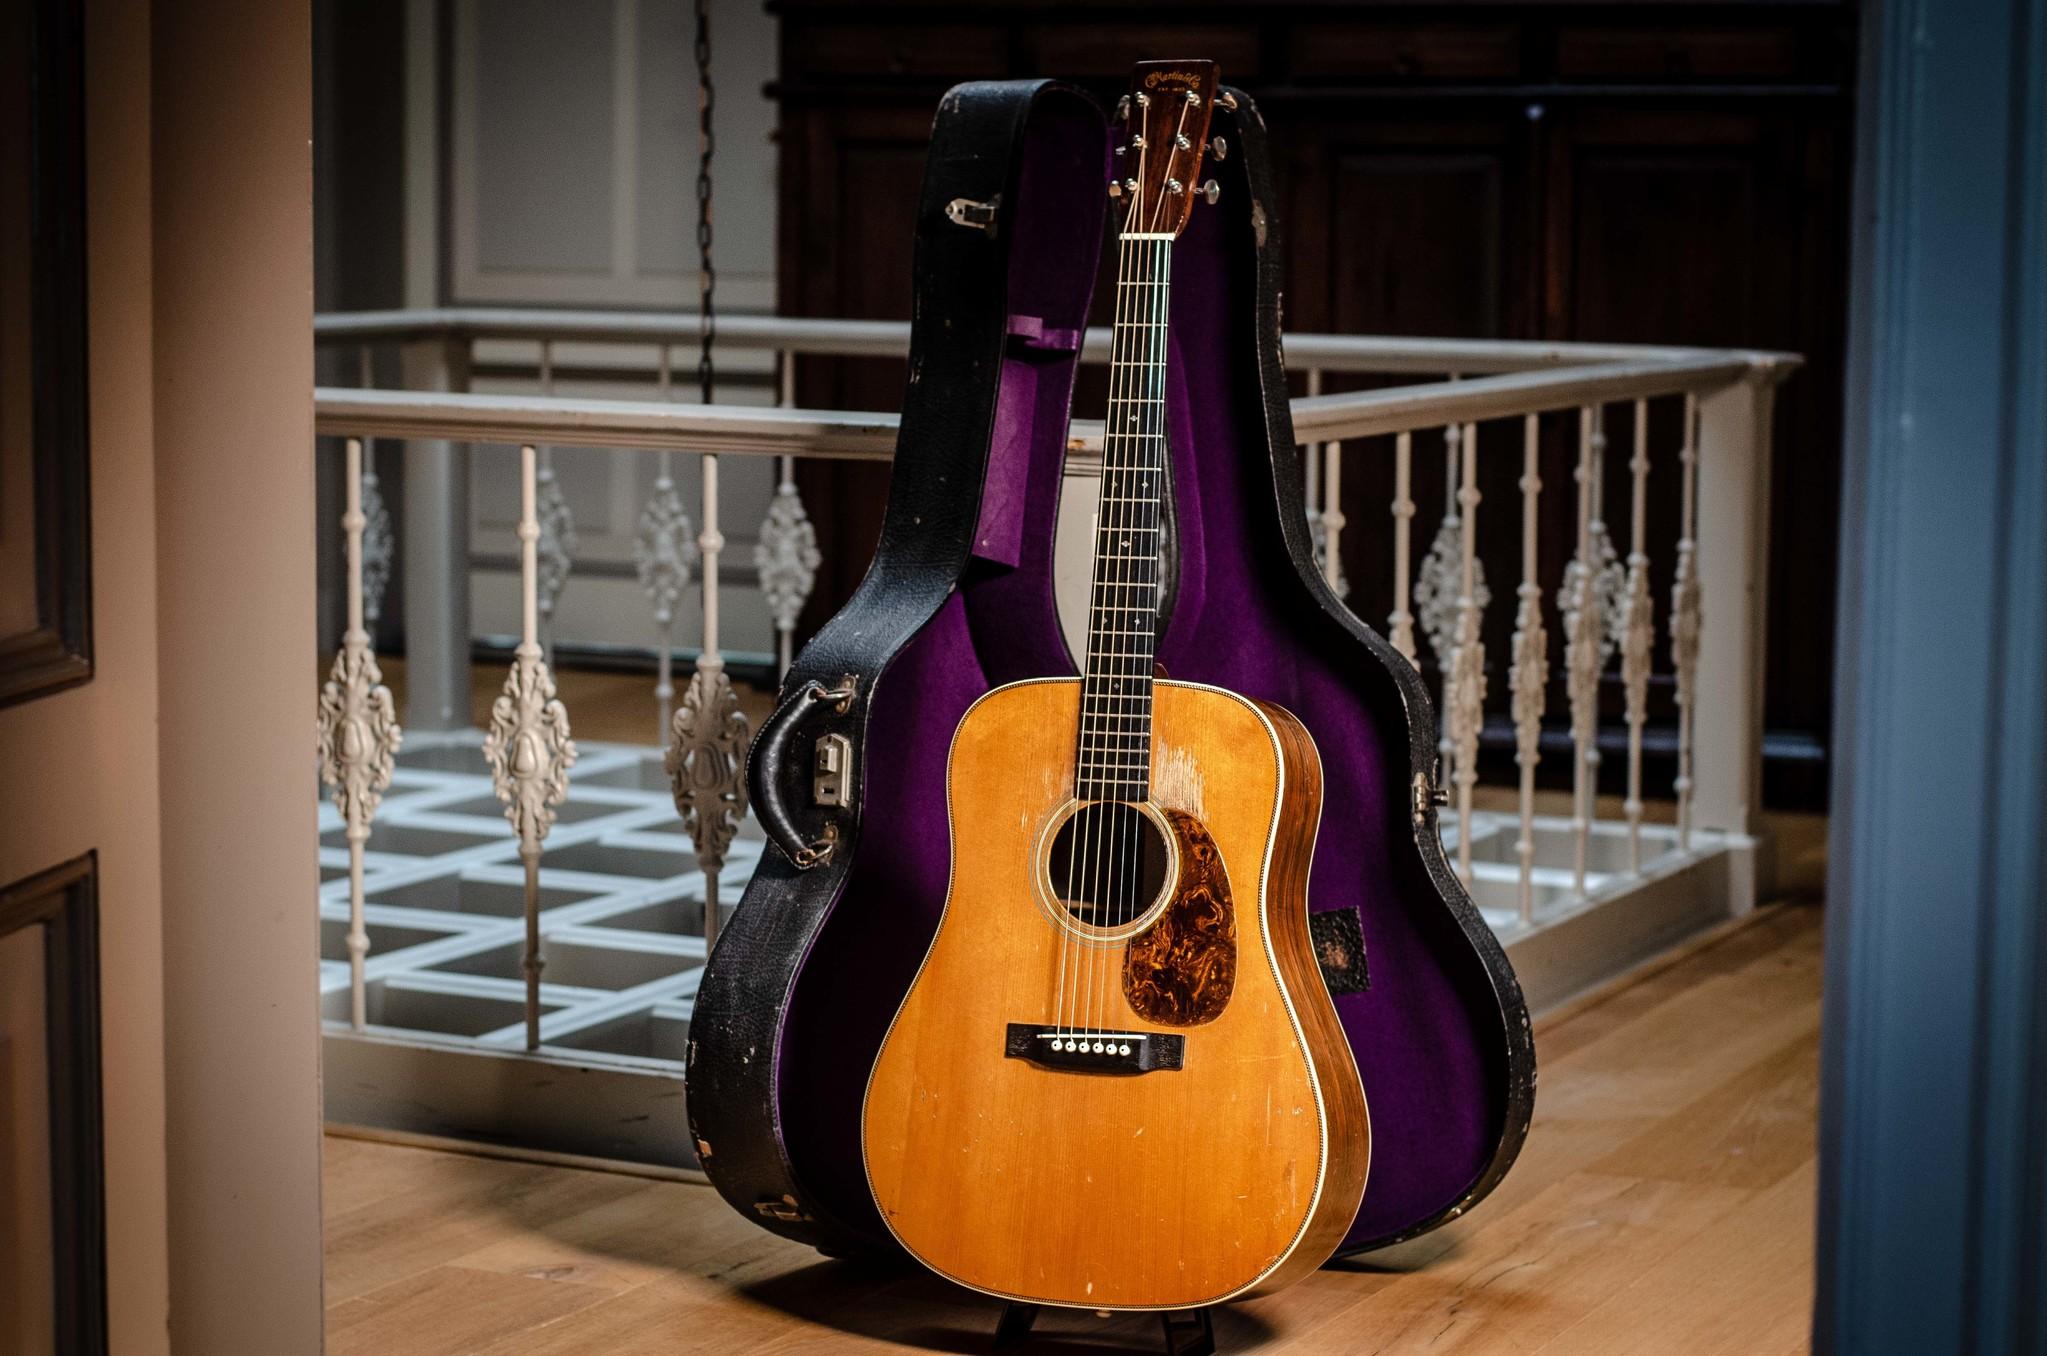 Vintage Gitaren Kopen, 5 Tips & Tricks!